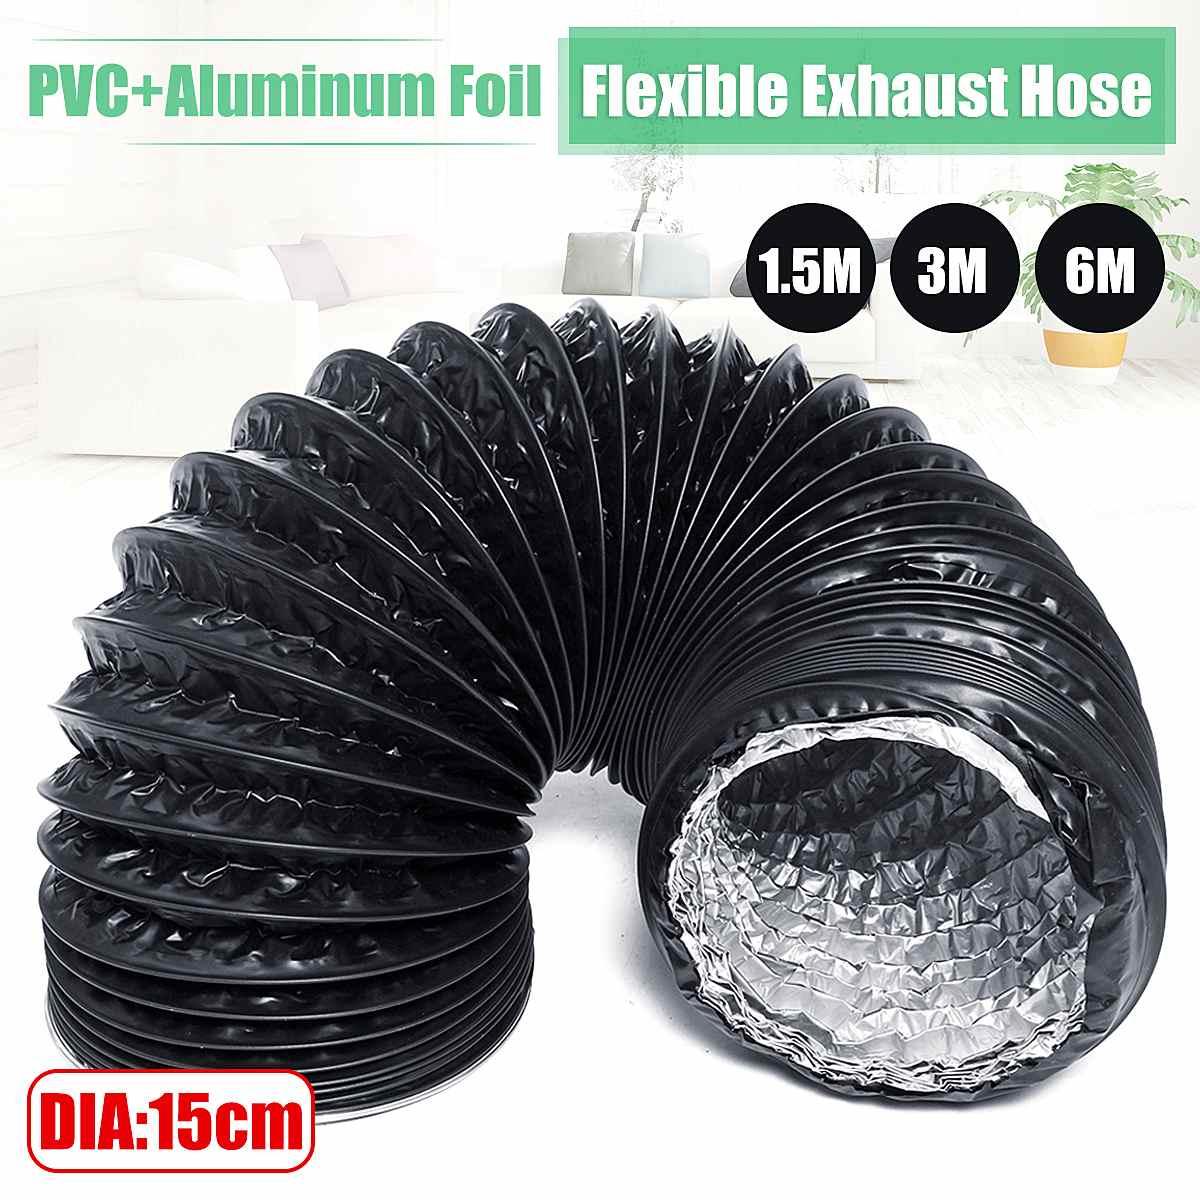 Flexible Exhaust Tube DIA 15cm 1.5M/3M/6M PVC Aluminum Air Ventilation System Ventilator Hose Pipe Kitchen Bathroom Accessories